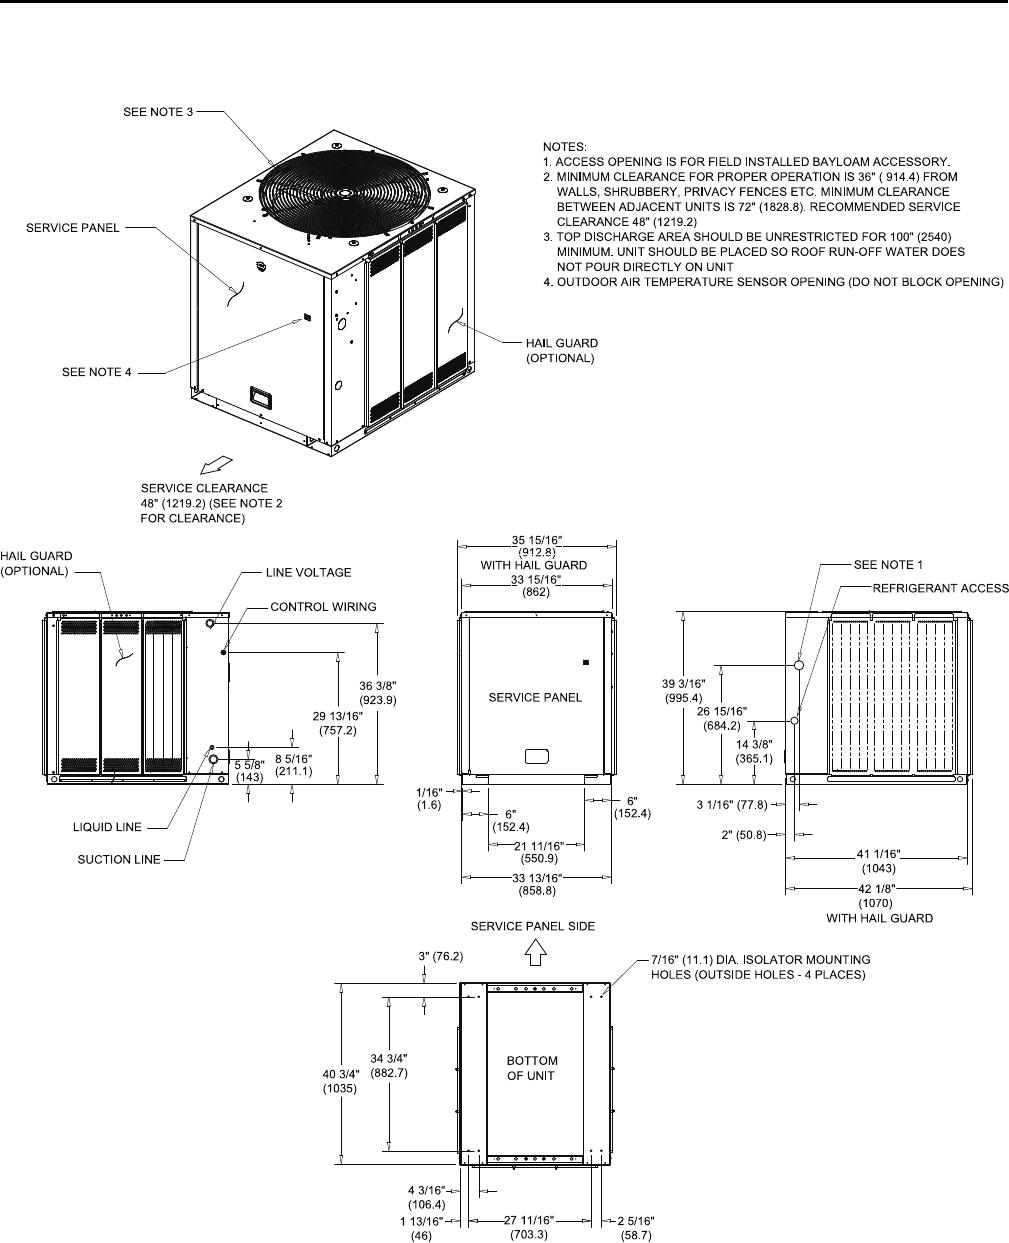 Trane Odyssey 6 To 25 Tons Installation And Maintenance Manual Split Pressor Wiring Diagrams Model Ssp Svx15c En 11